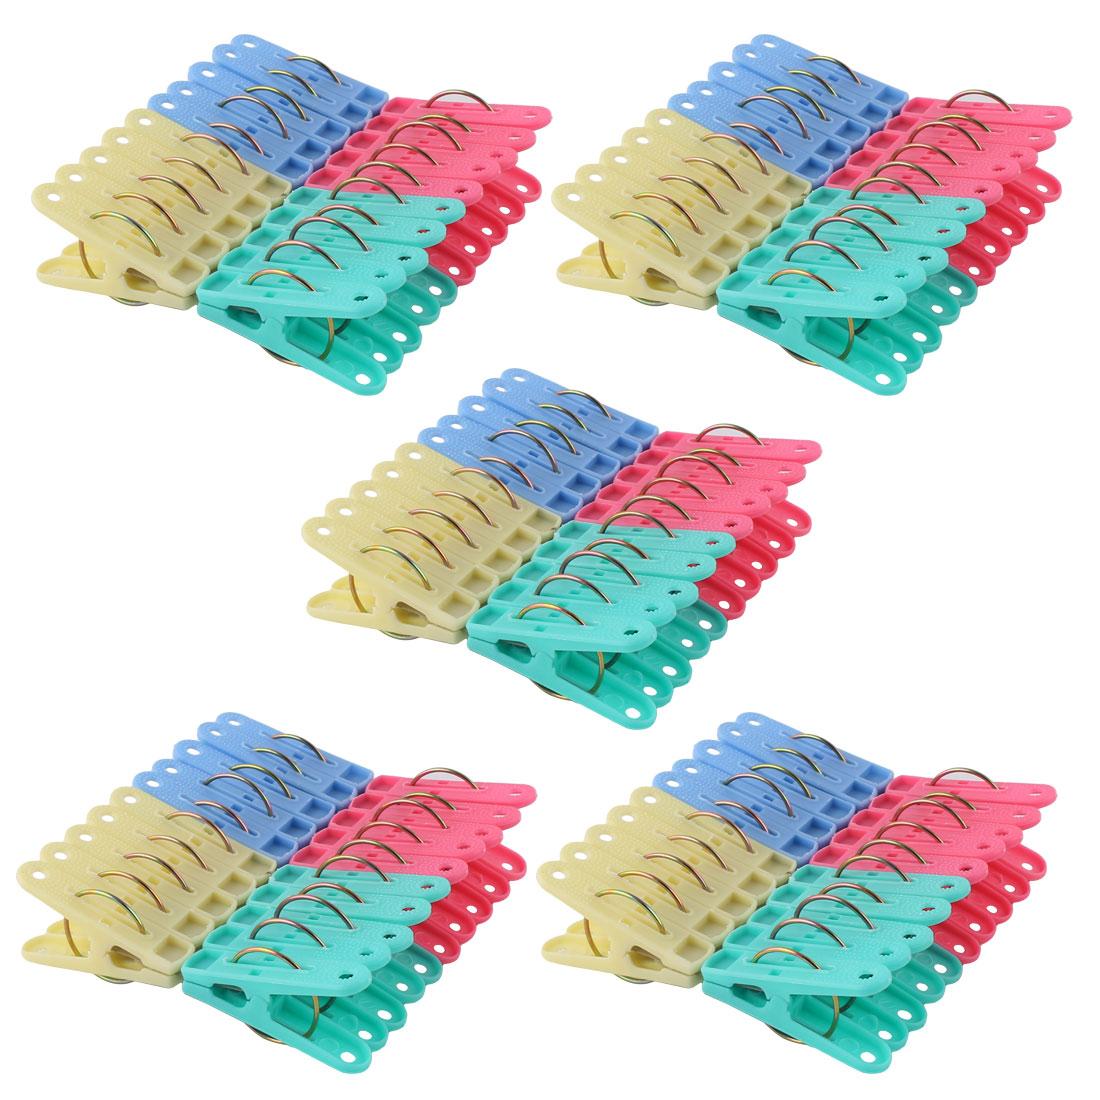 Home Plastic Socks Towel Clothing Clothes Clips Clamp Hanger 100pcs